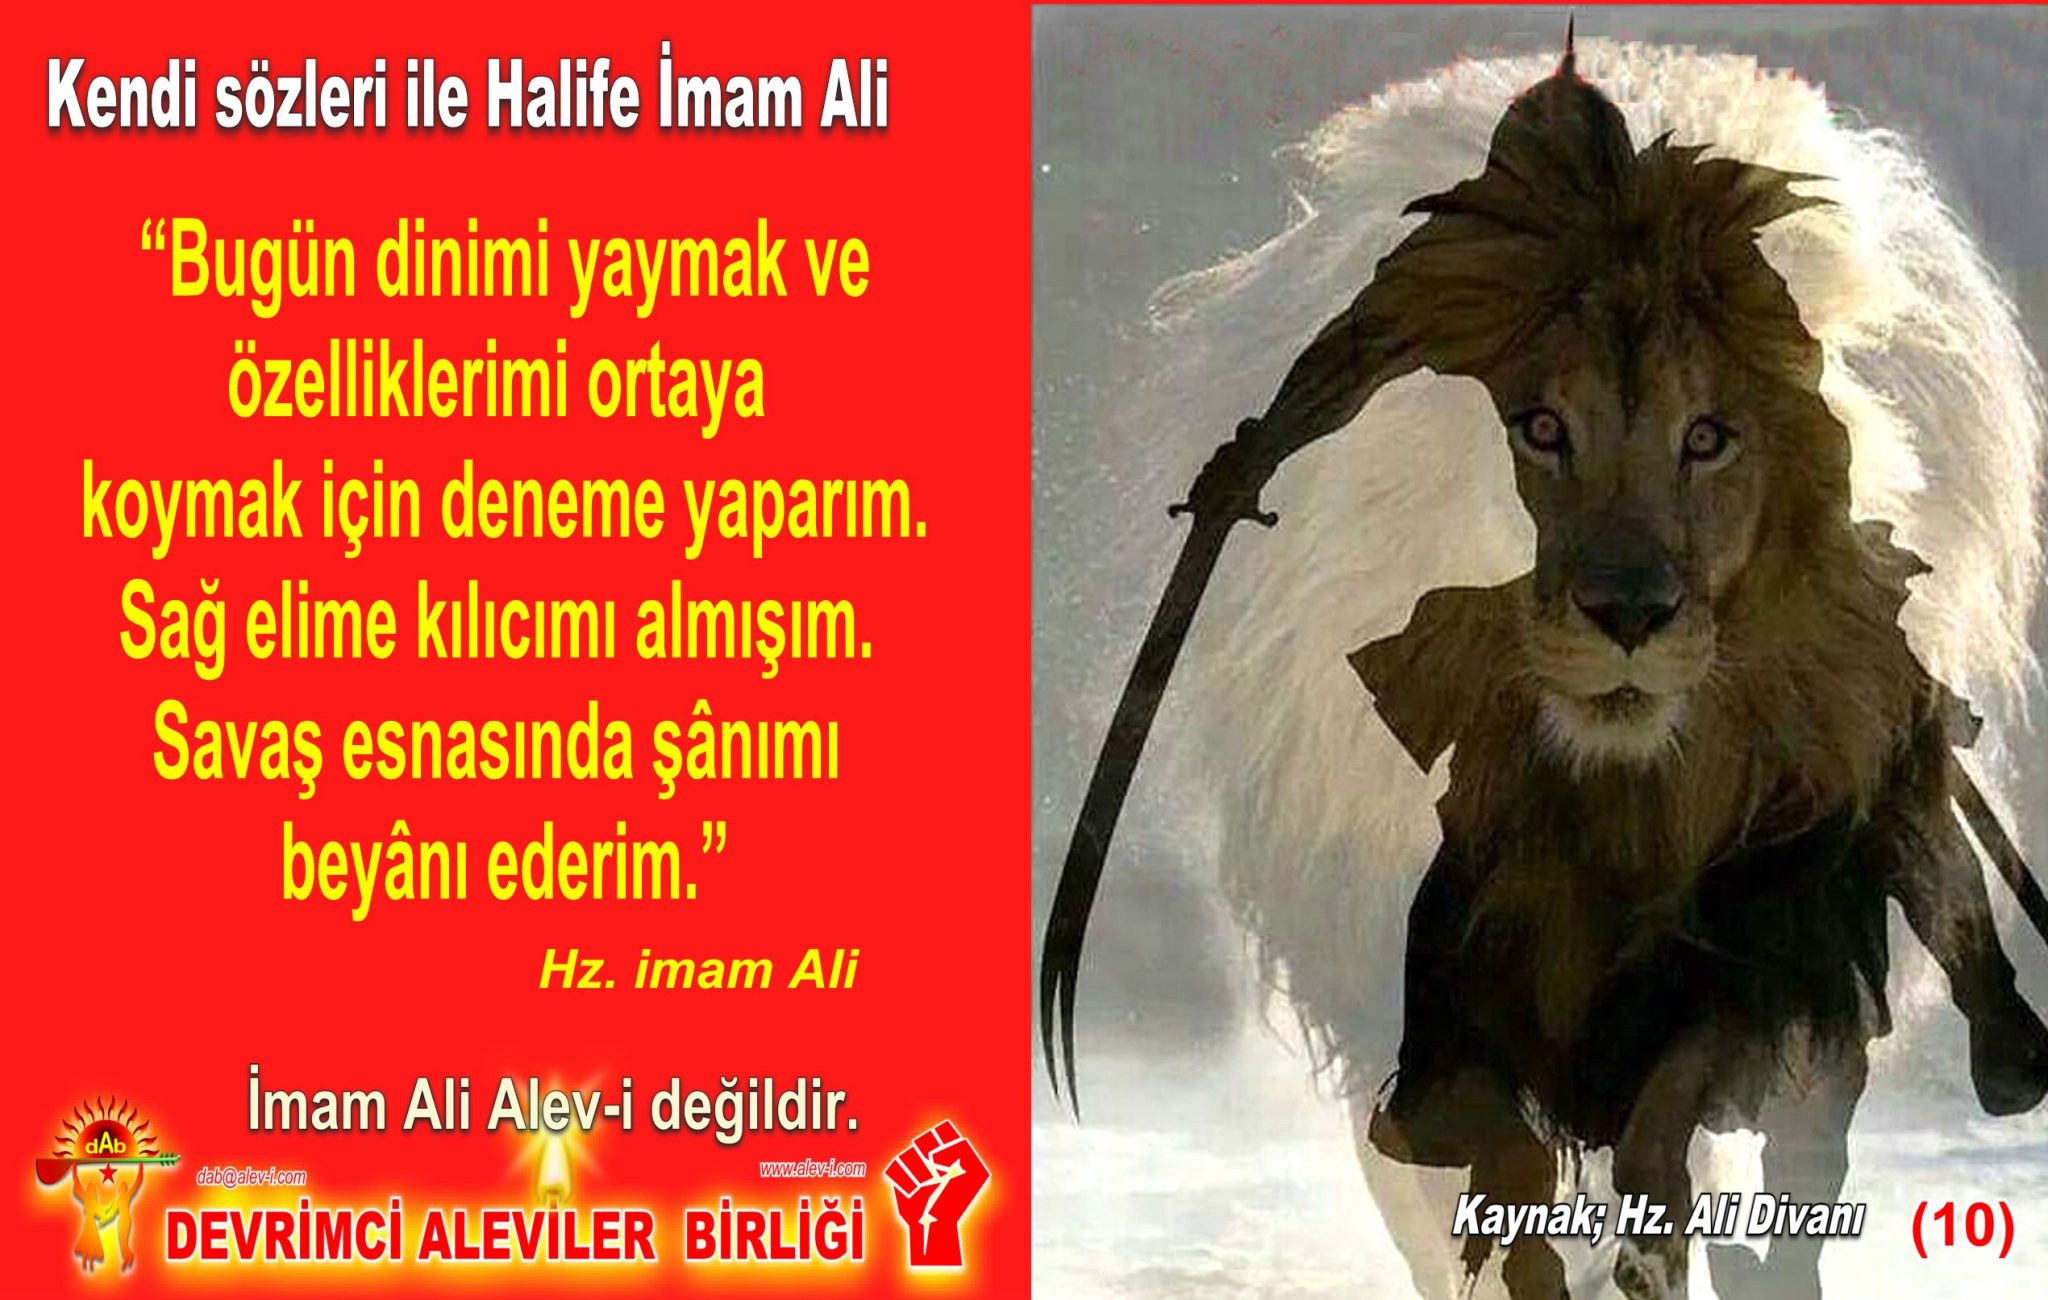 10 Hz imam Ali divani Alevi bektasi kizilbas pir sultan devrimci aleviler birligi DAB Feramuz Sah Acar